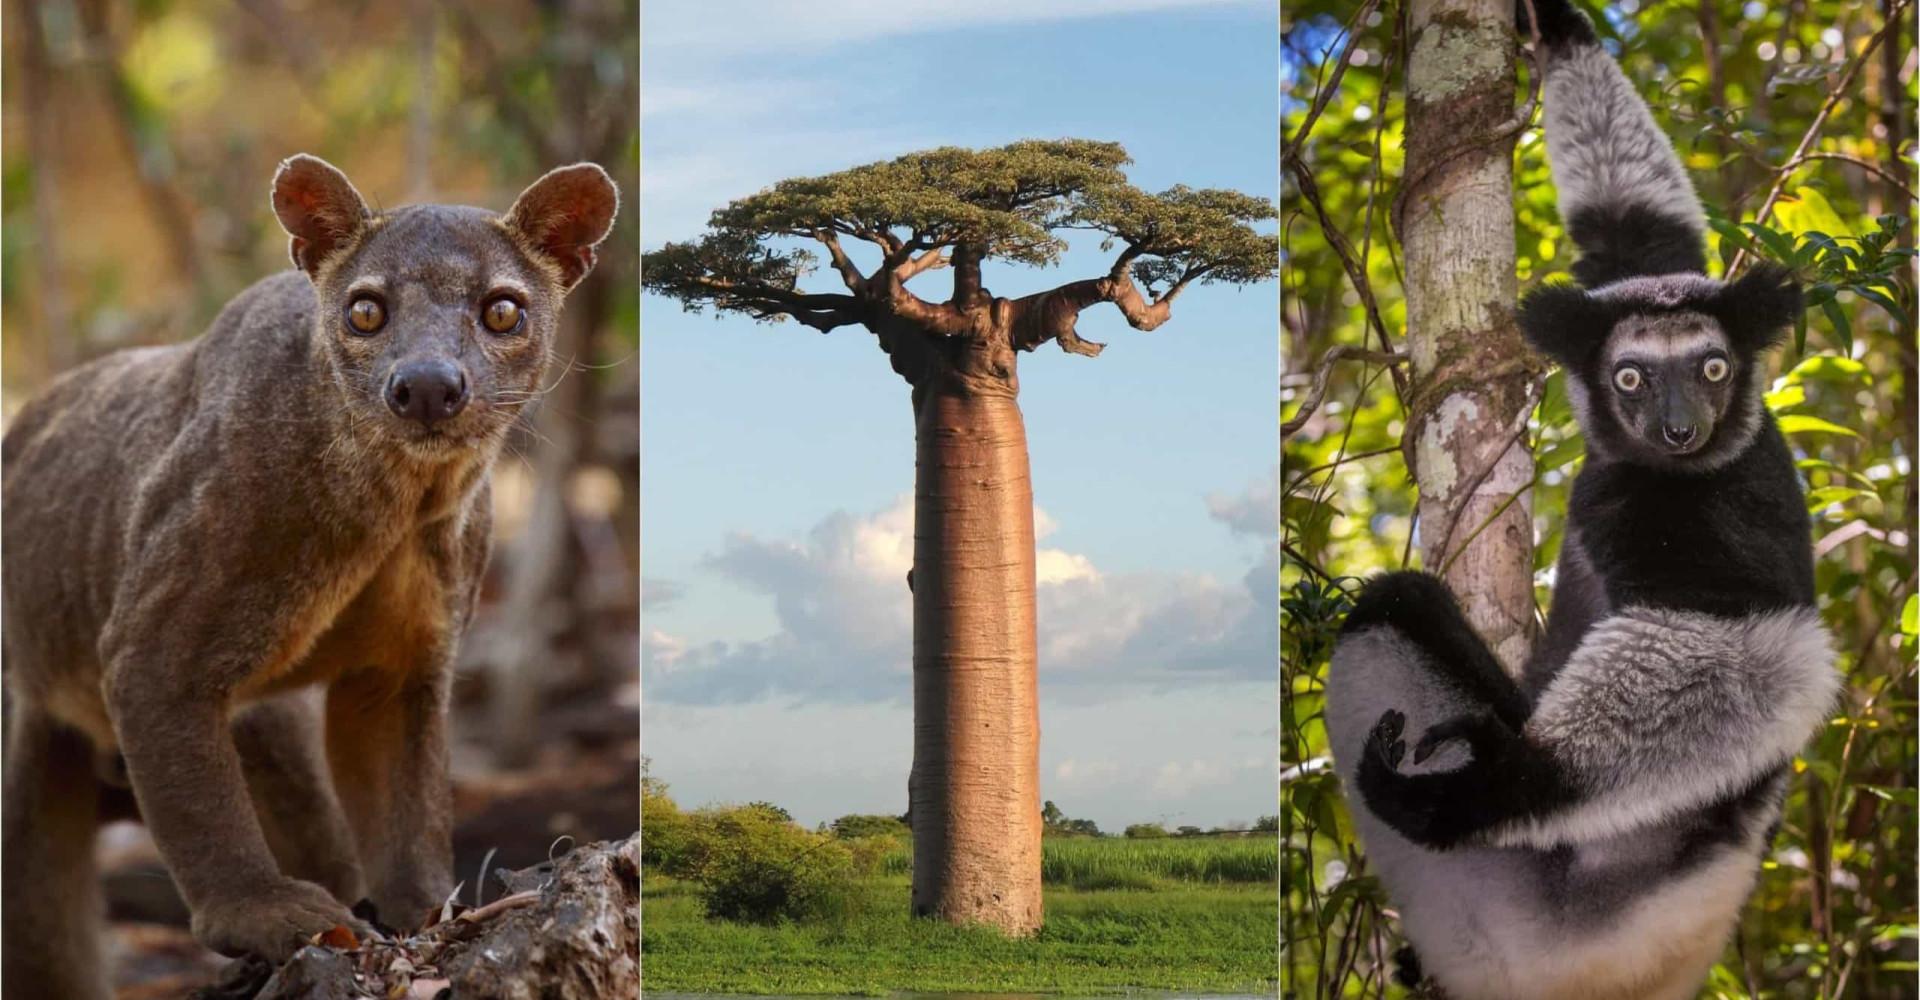 Tutustu suurenmoiseen Madagaskariin!